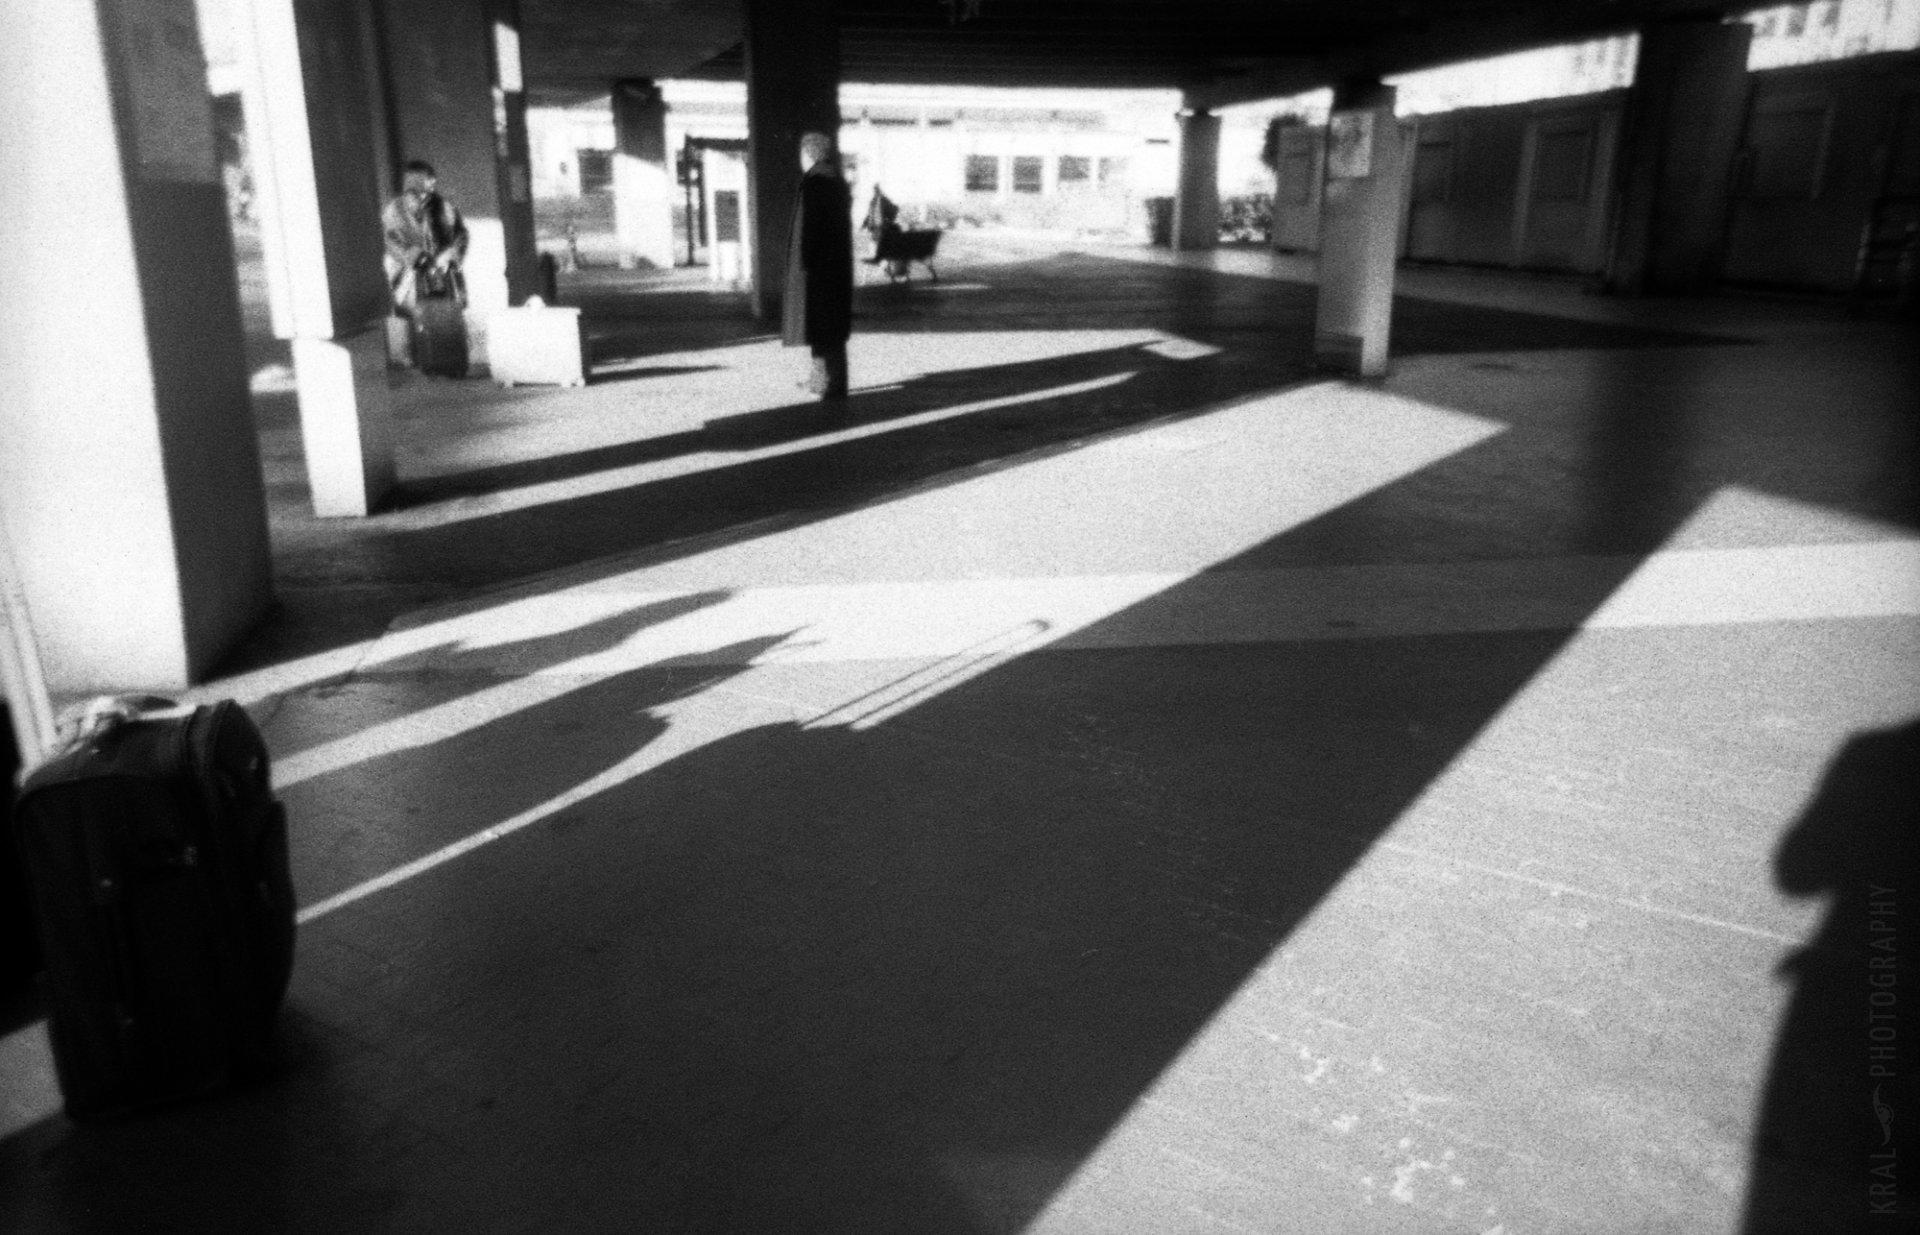 © Holger Kral • Photography - 08-01-021 - 2007, blackwhite, italy, journey, landscape, street, urban landscape, winter - photo #1